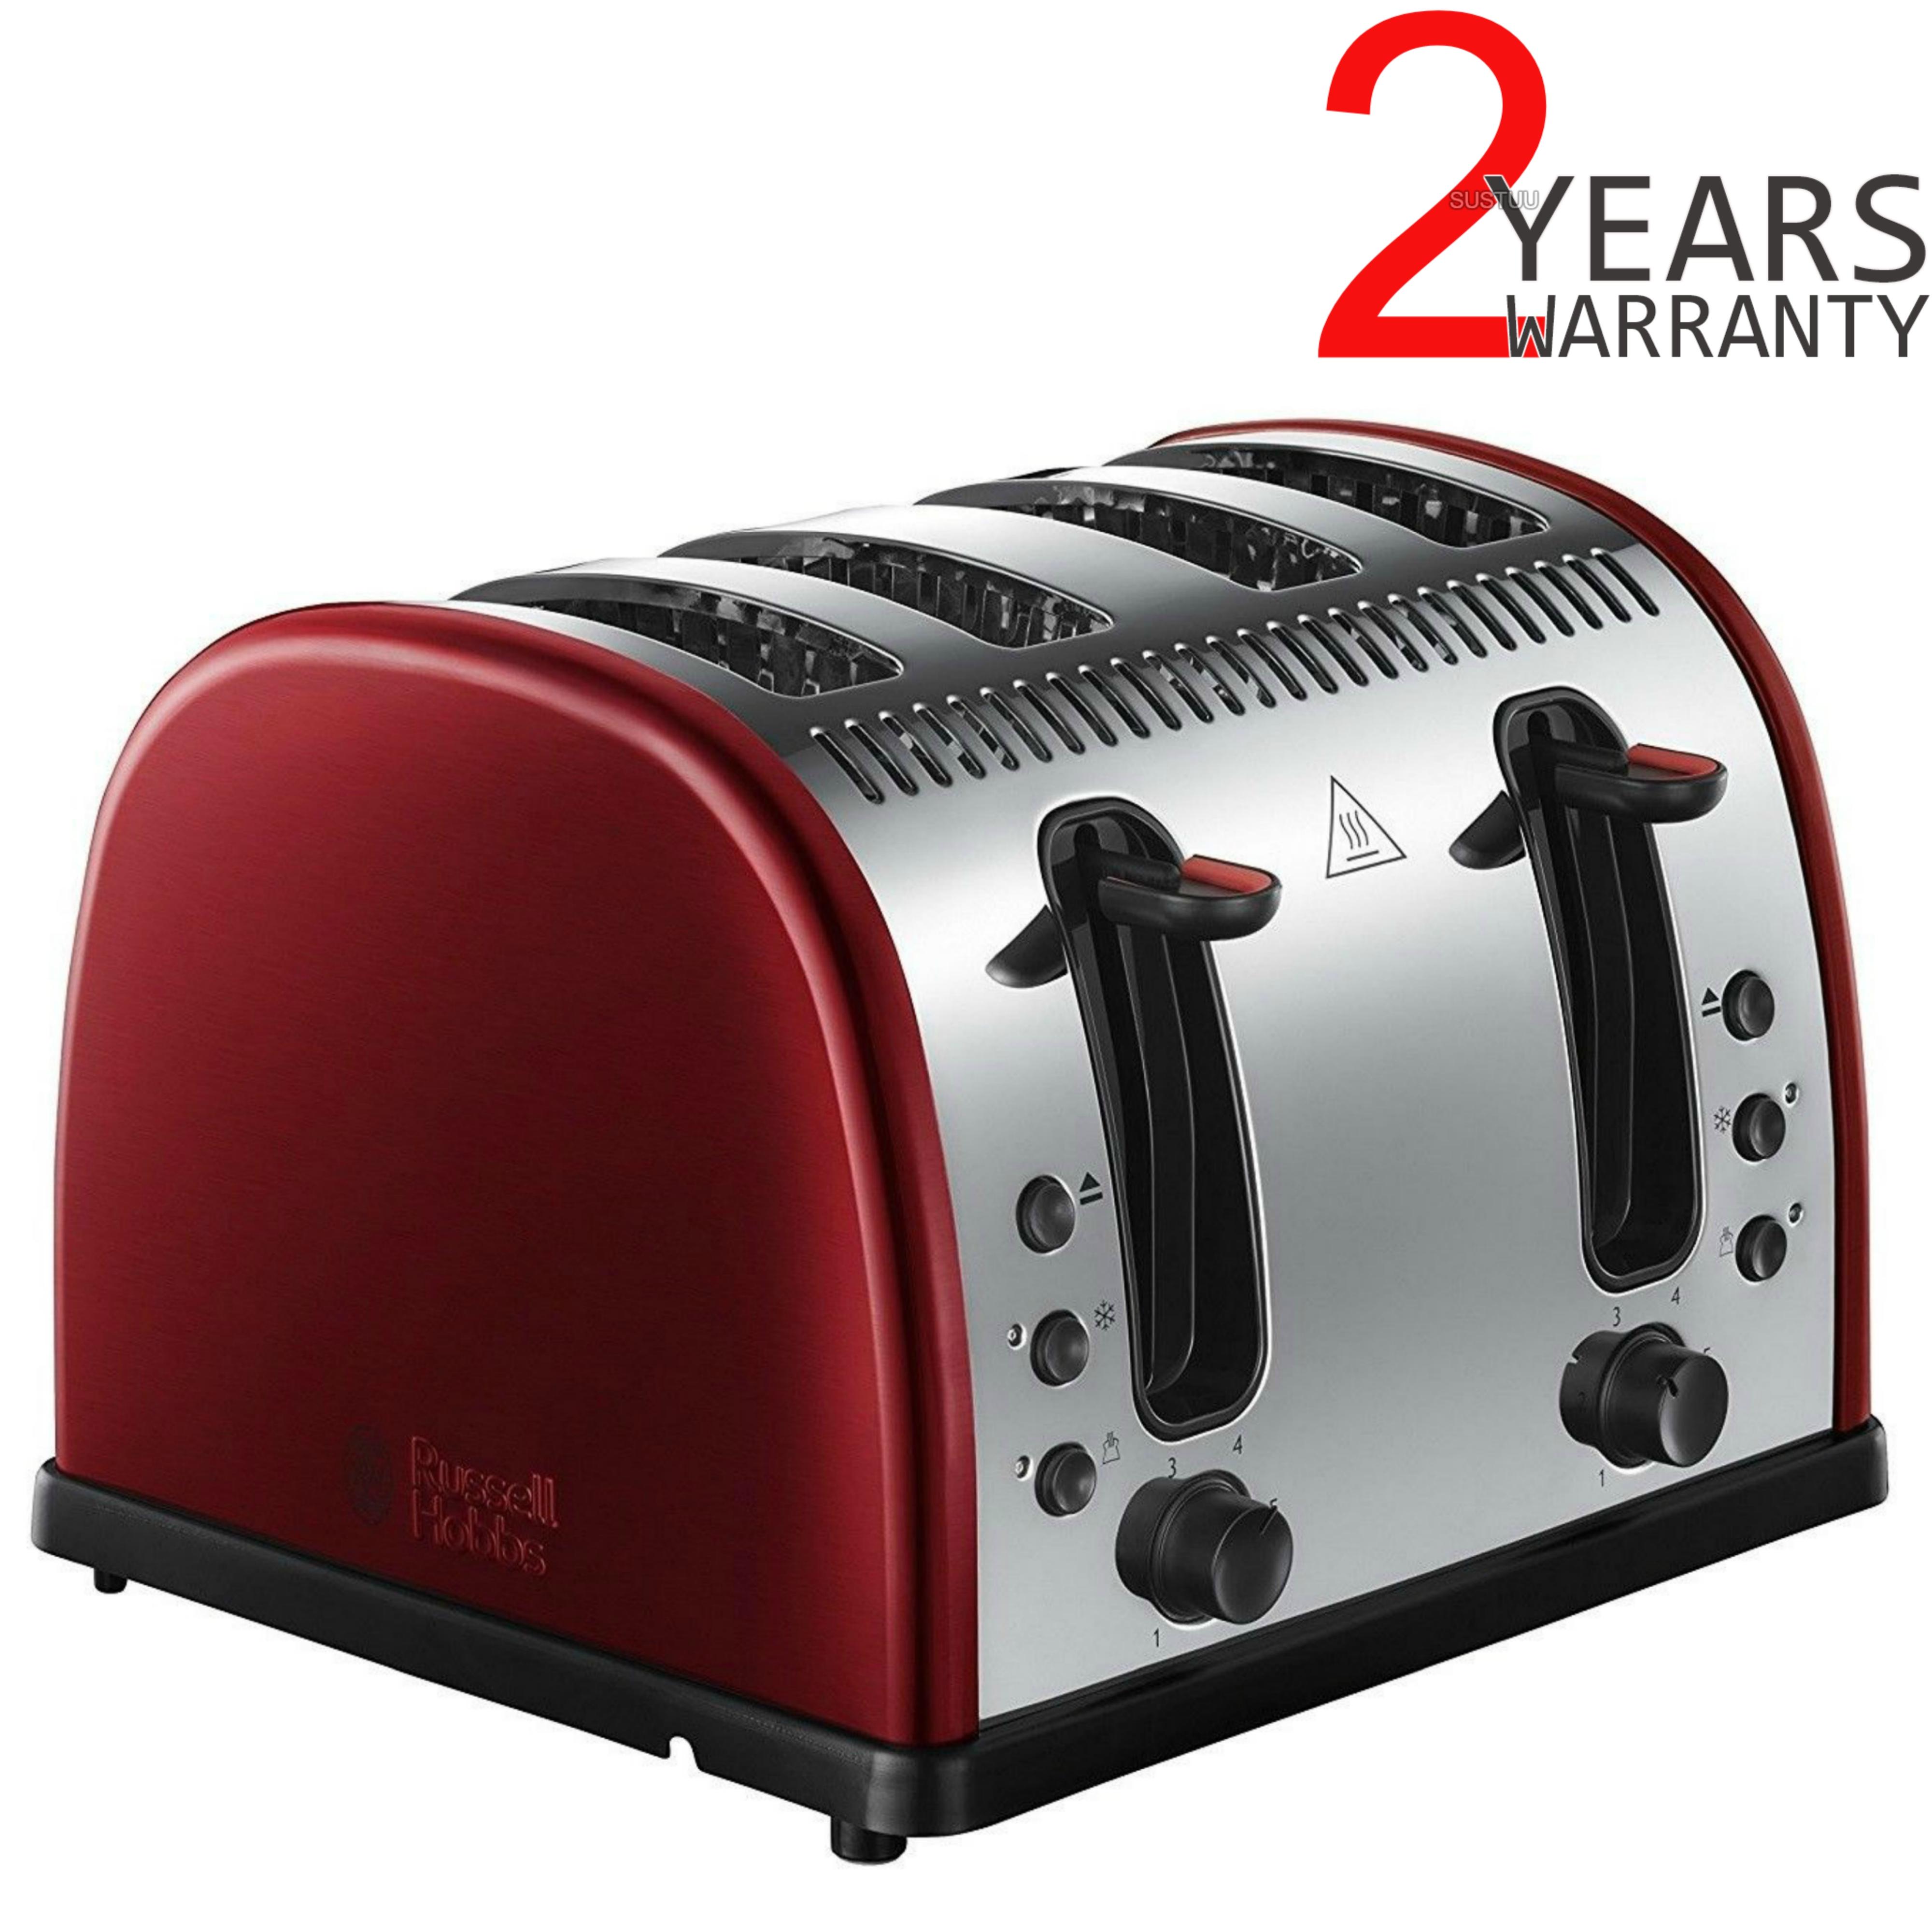 Russell Hobbs RU-21301 Legacy 4-Slice Toaster | 2 & 4 Slice Operation | Metallic Red